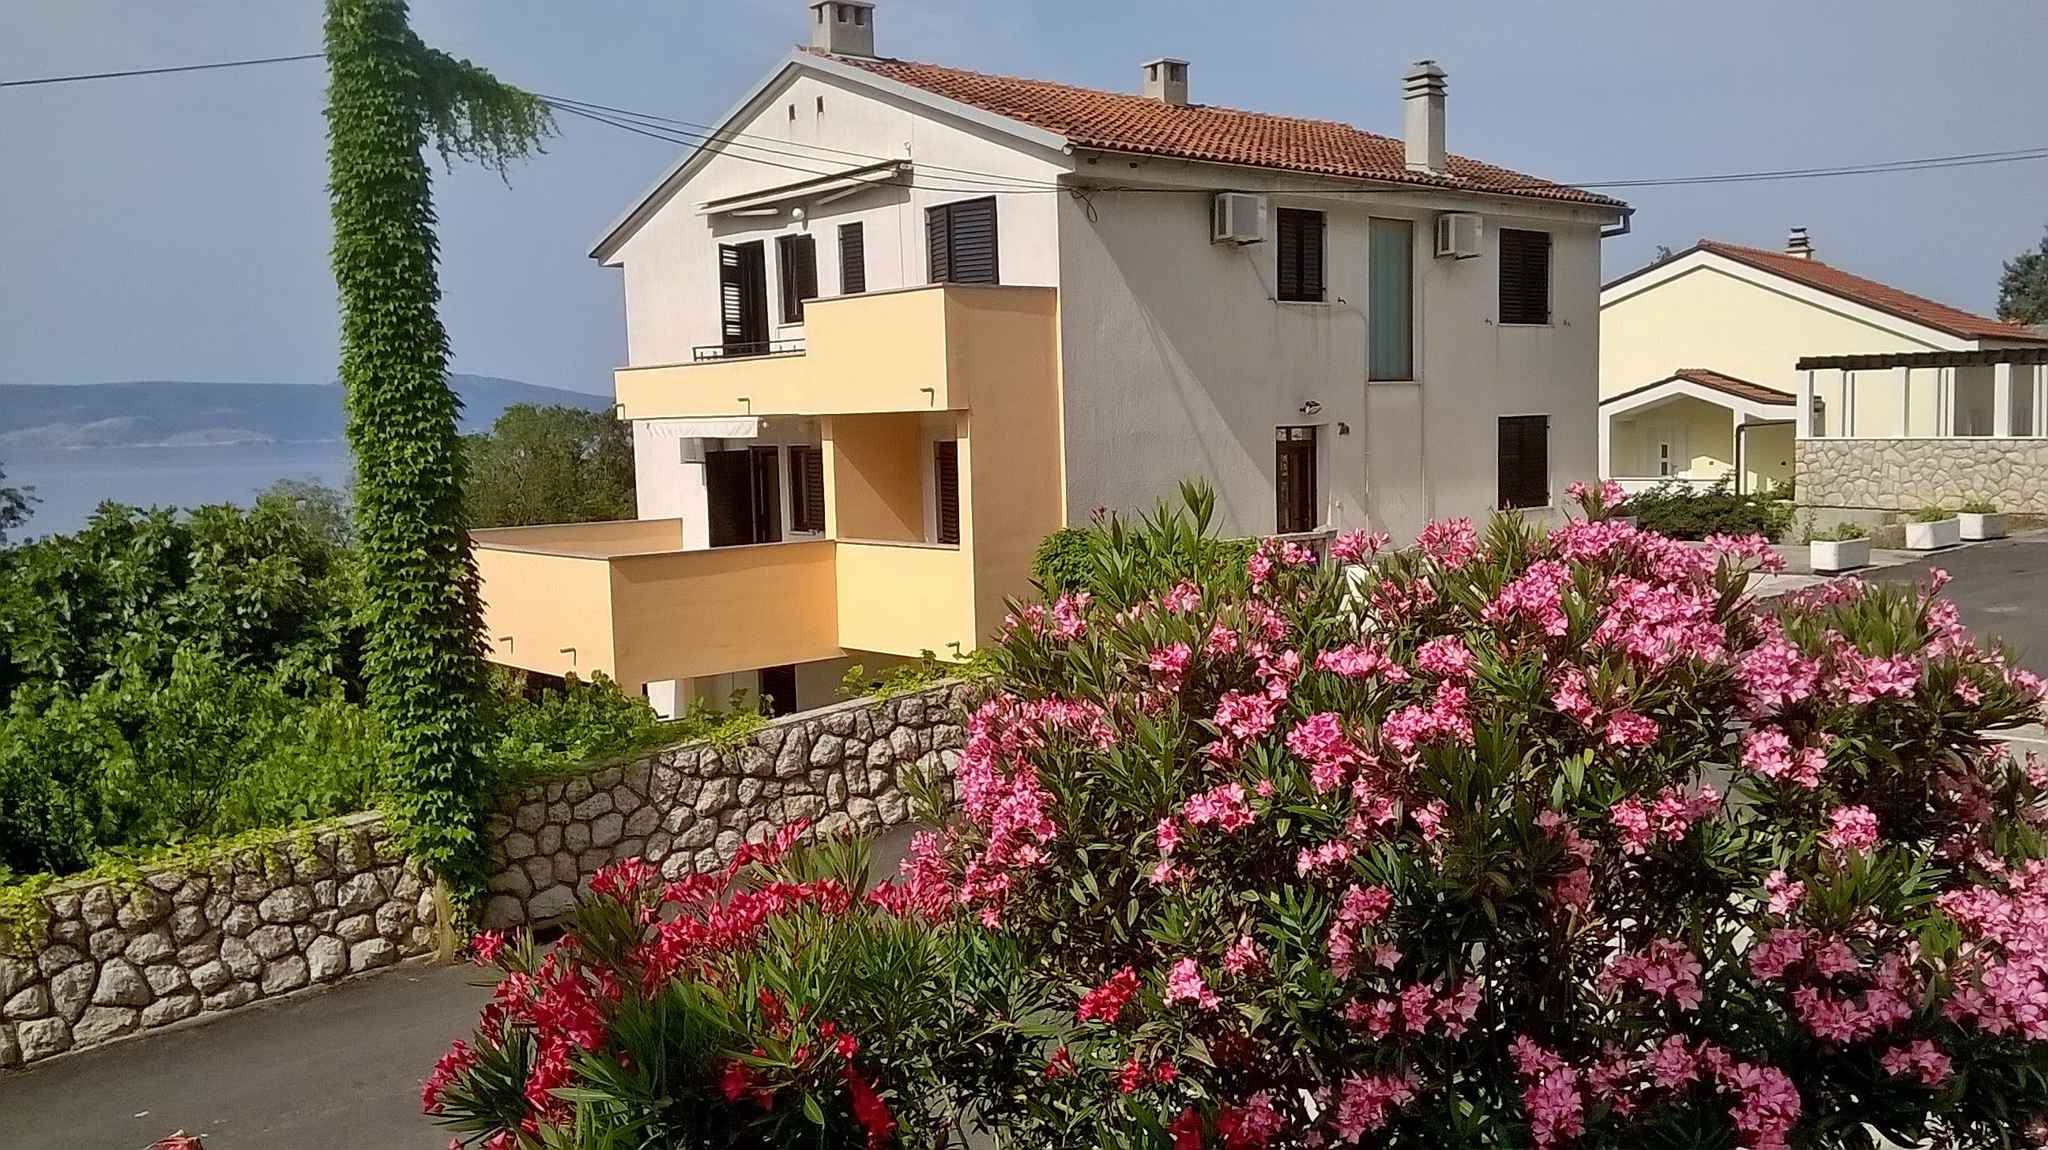 Appartement de vacances nahe von Meer, WI-FI, Klima (2182509), Novi Vinodolski, , Kvarner, Croatie, image 1